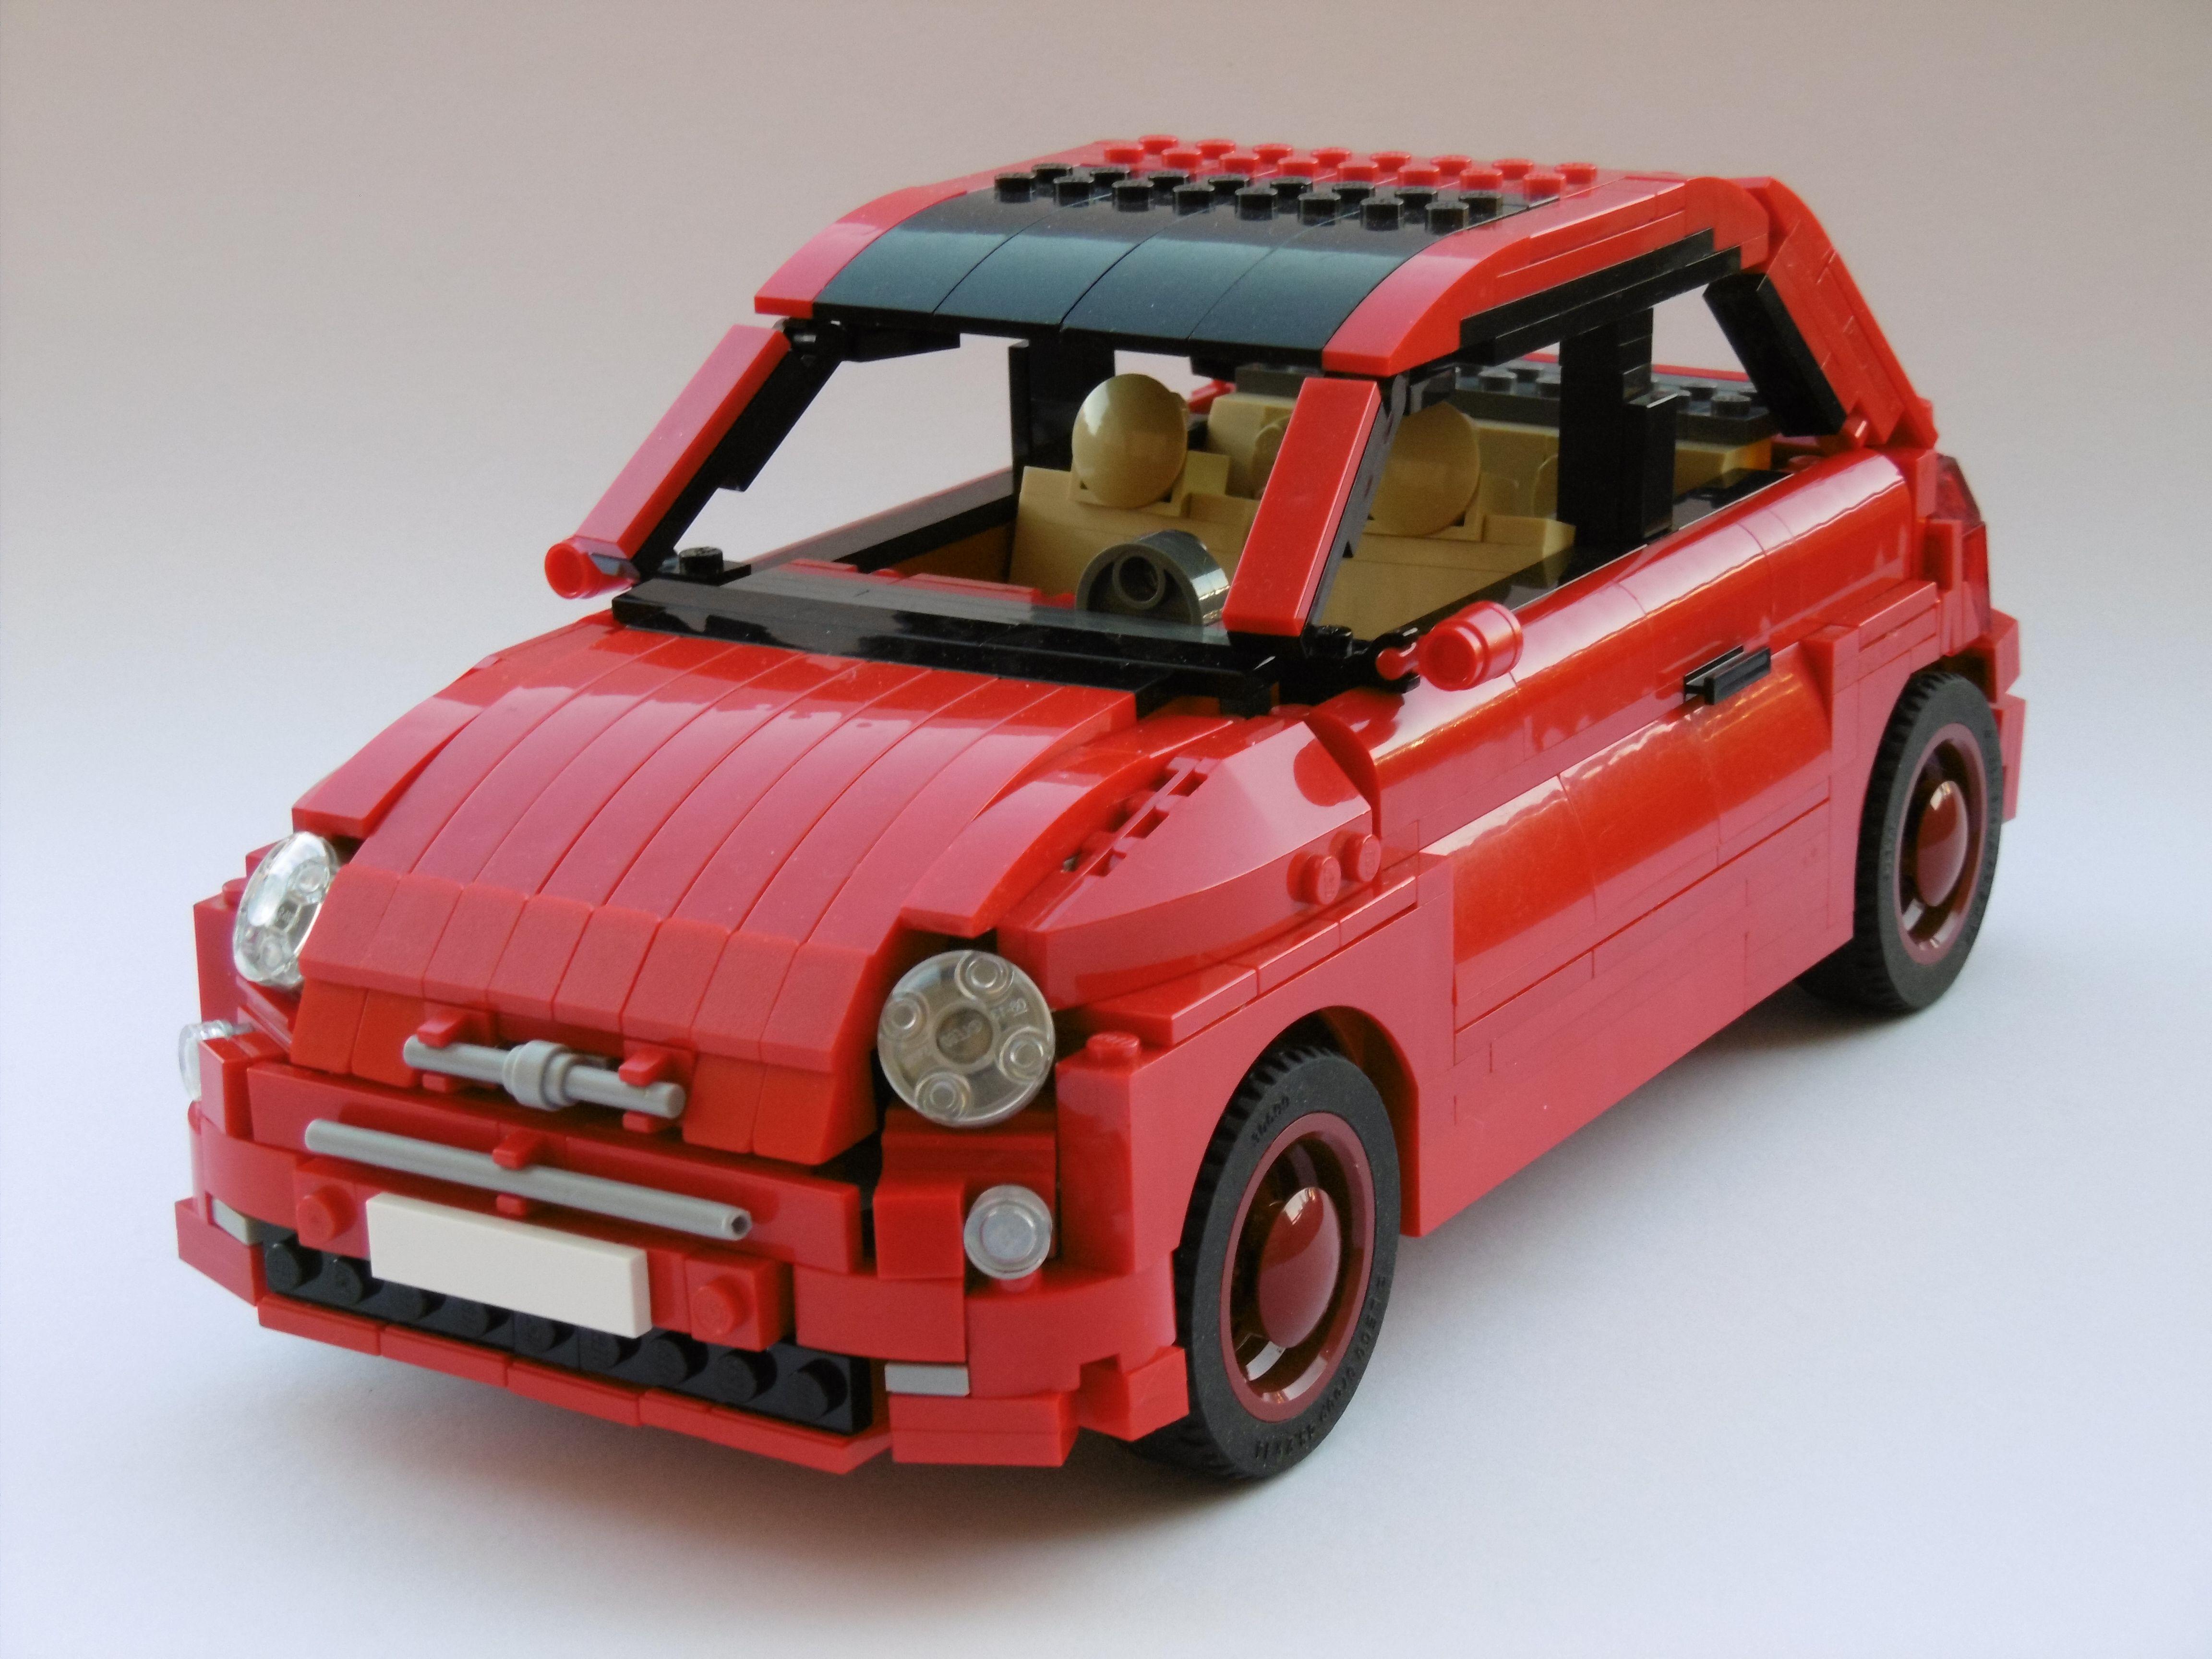 Lego Fiat 500 Lego Cars Lego Lego Pictures